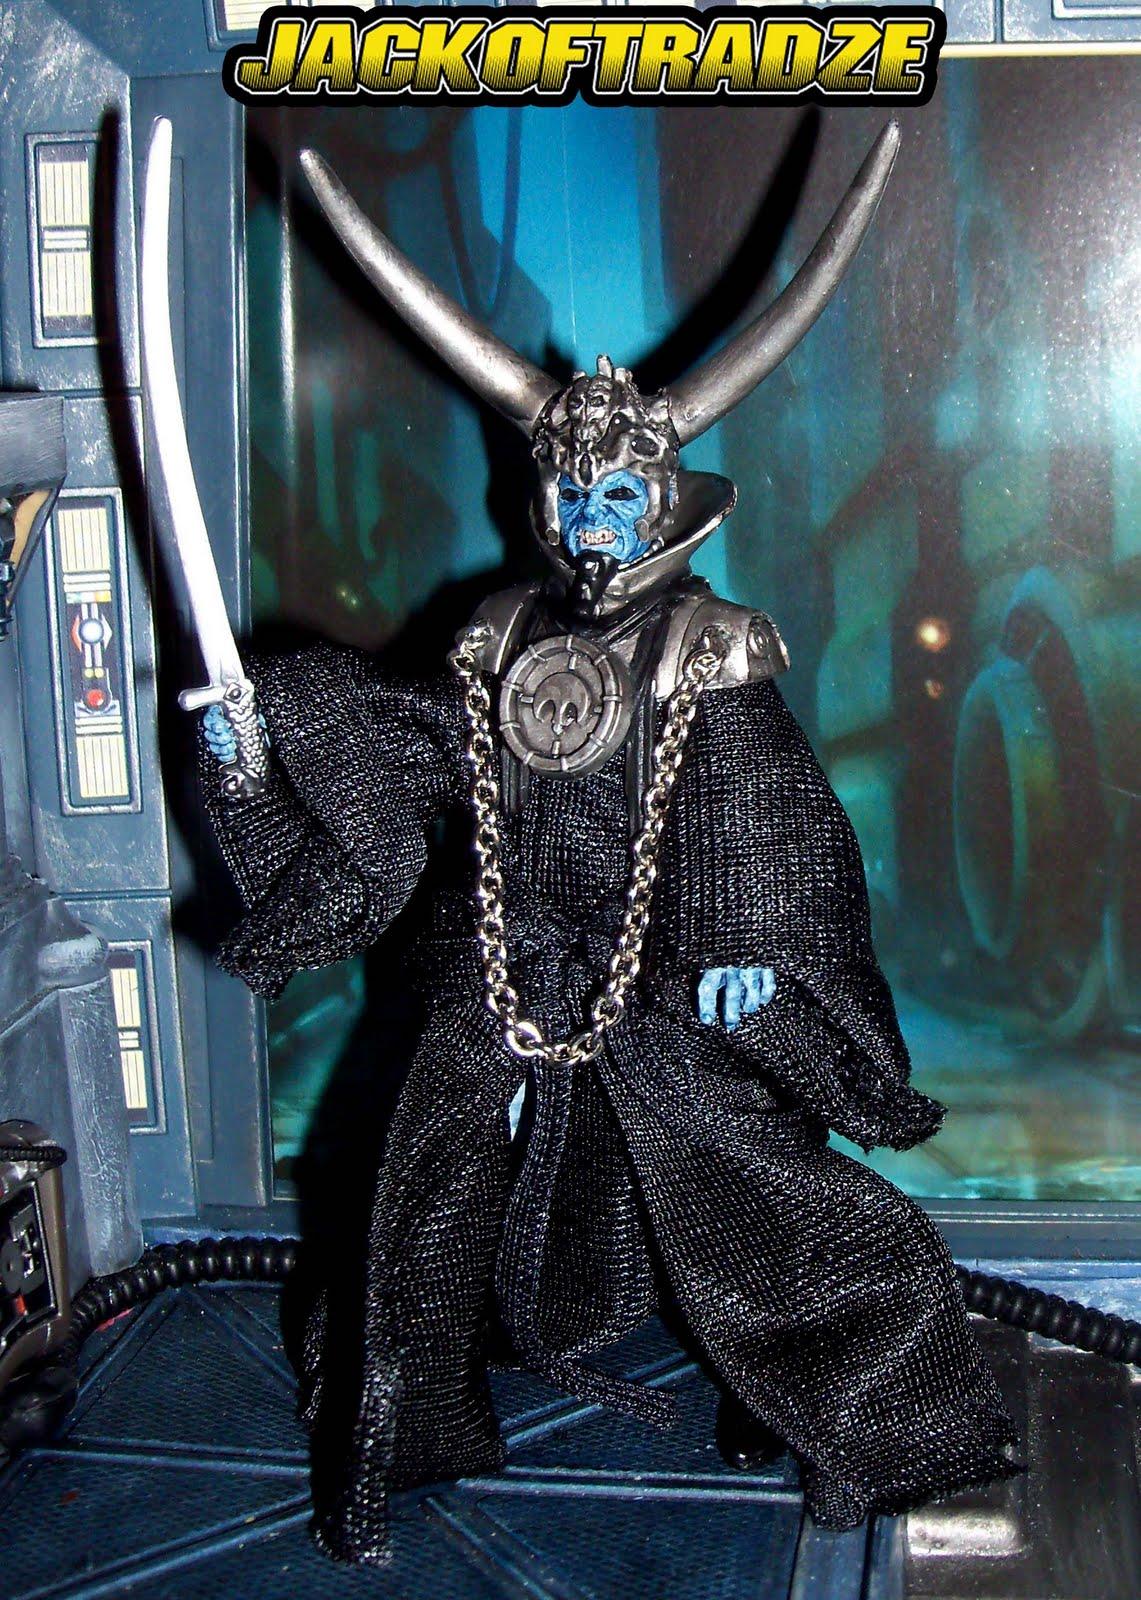 Jackoftradze Custom Star Wars Action Figures New Custom